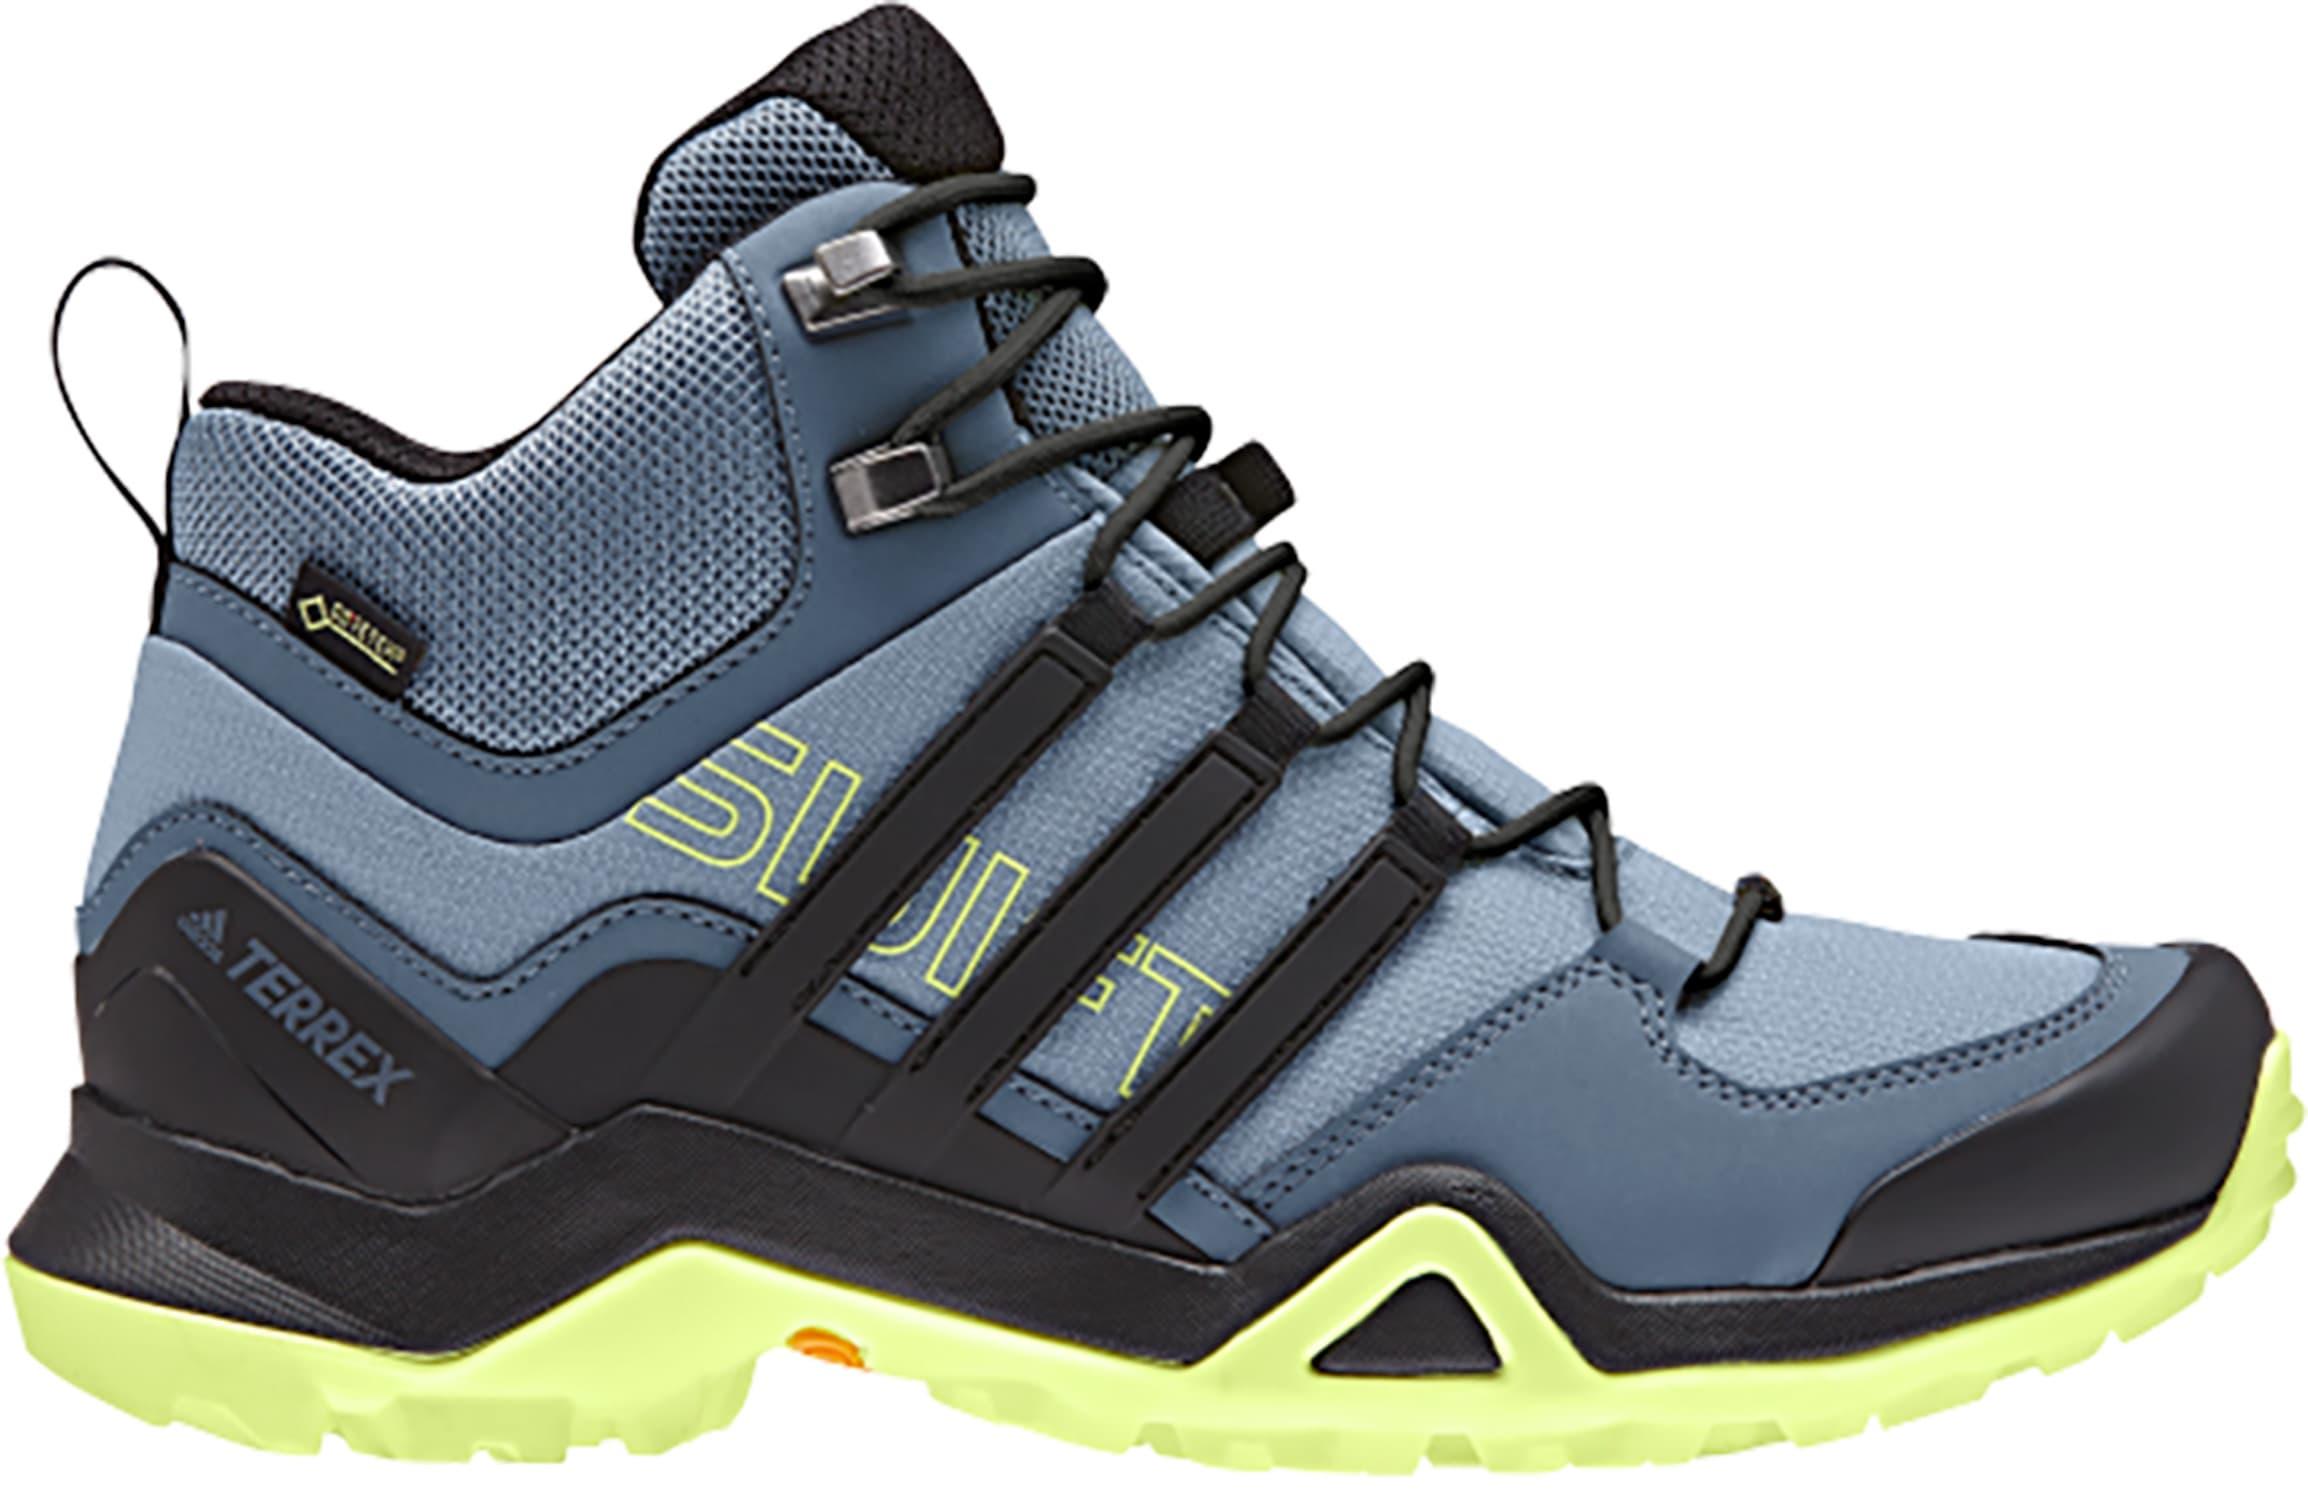 buy online 4a863 86380 Adidas Terrex Swift R2 Mid GTX Hiking Boots - thumbnail 1